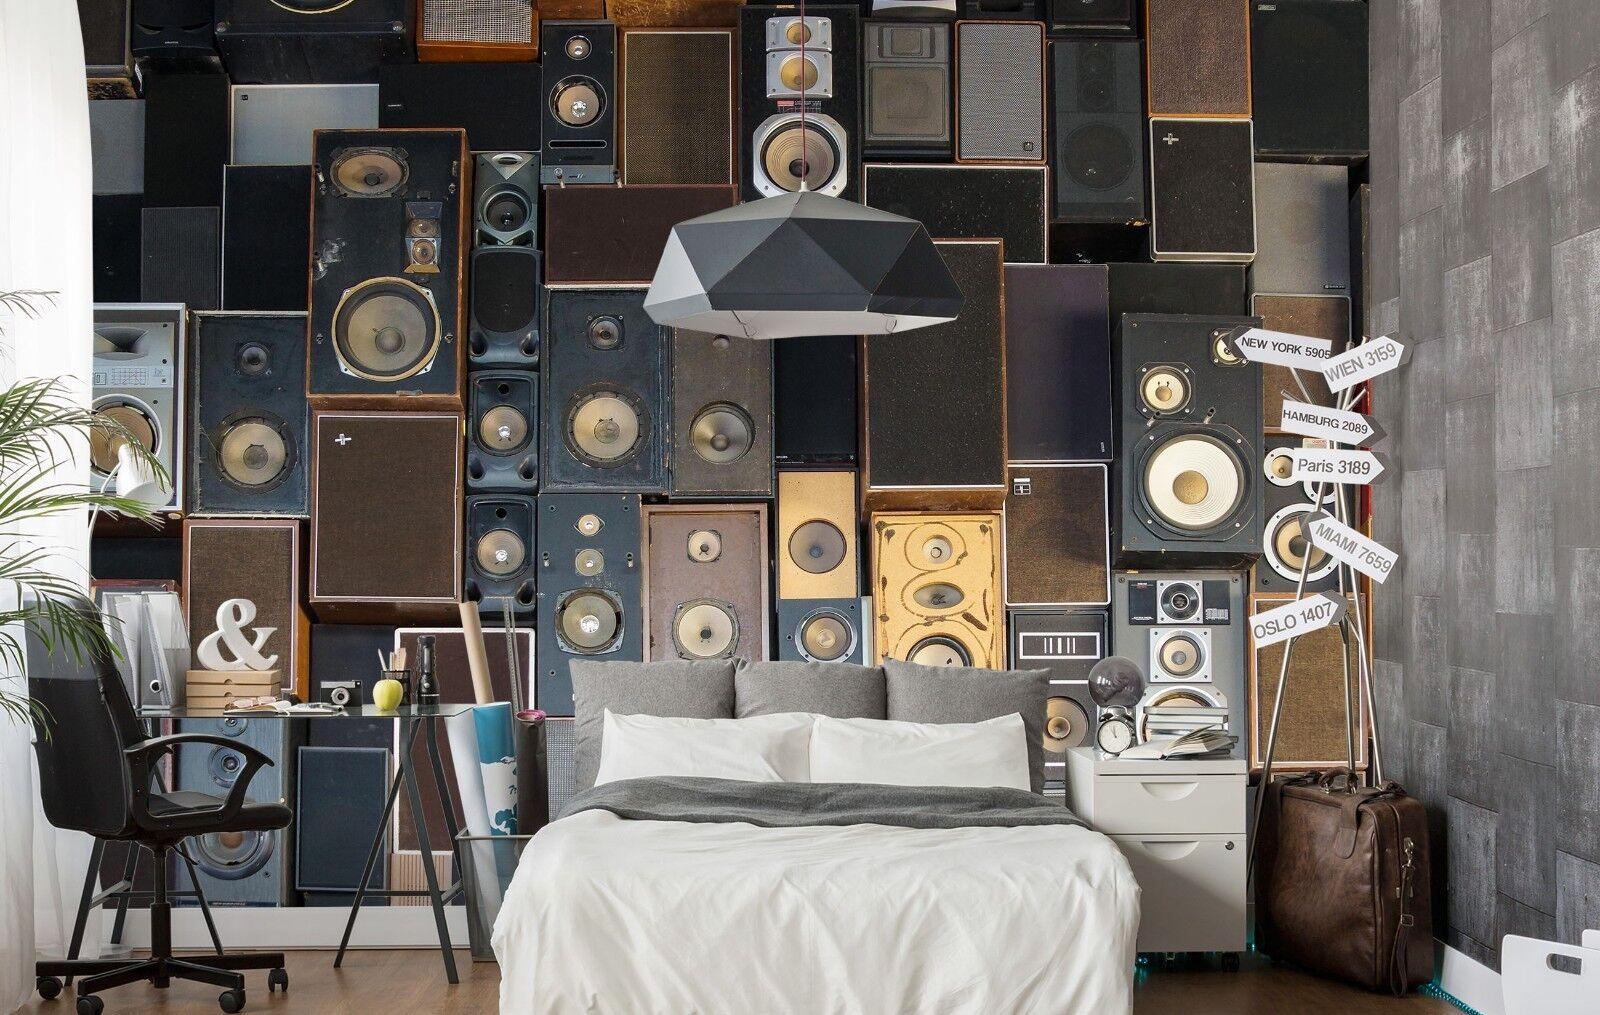 3D Speakers 7135 Wall Paper Print Wall Decal Deco Indoor Wall Murals US Summer